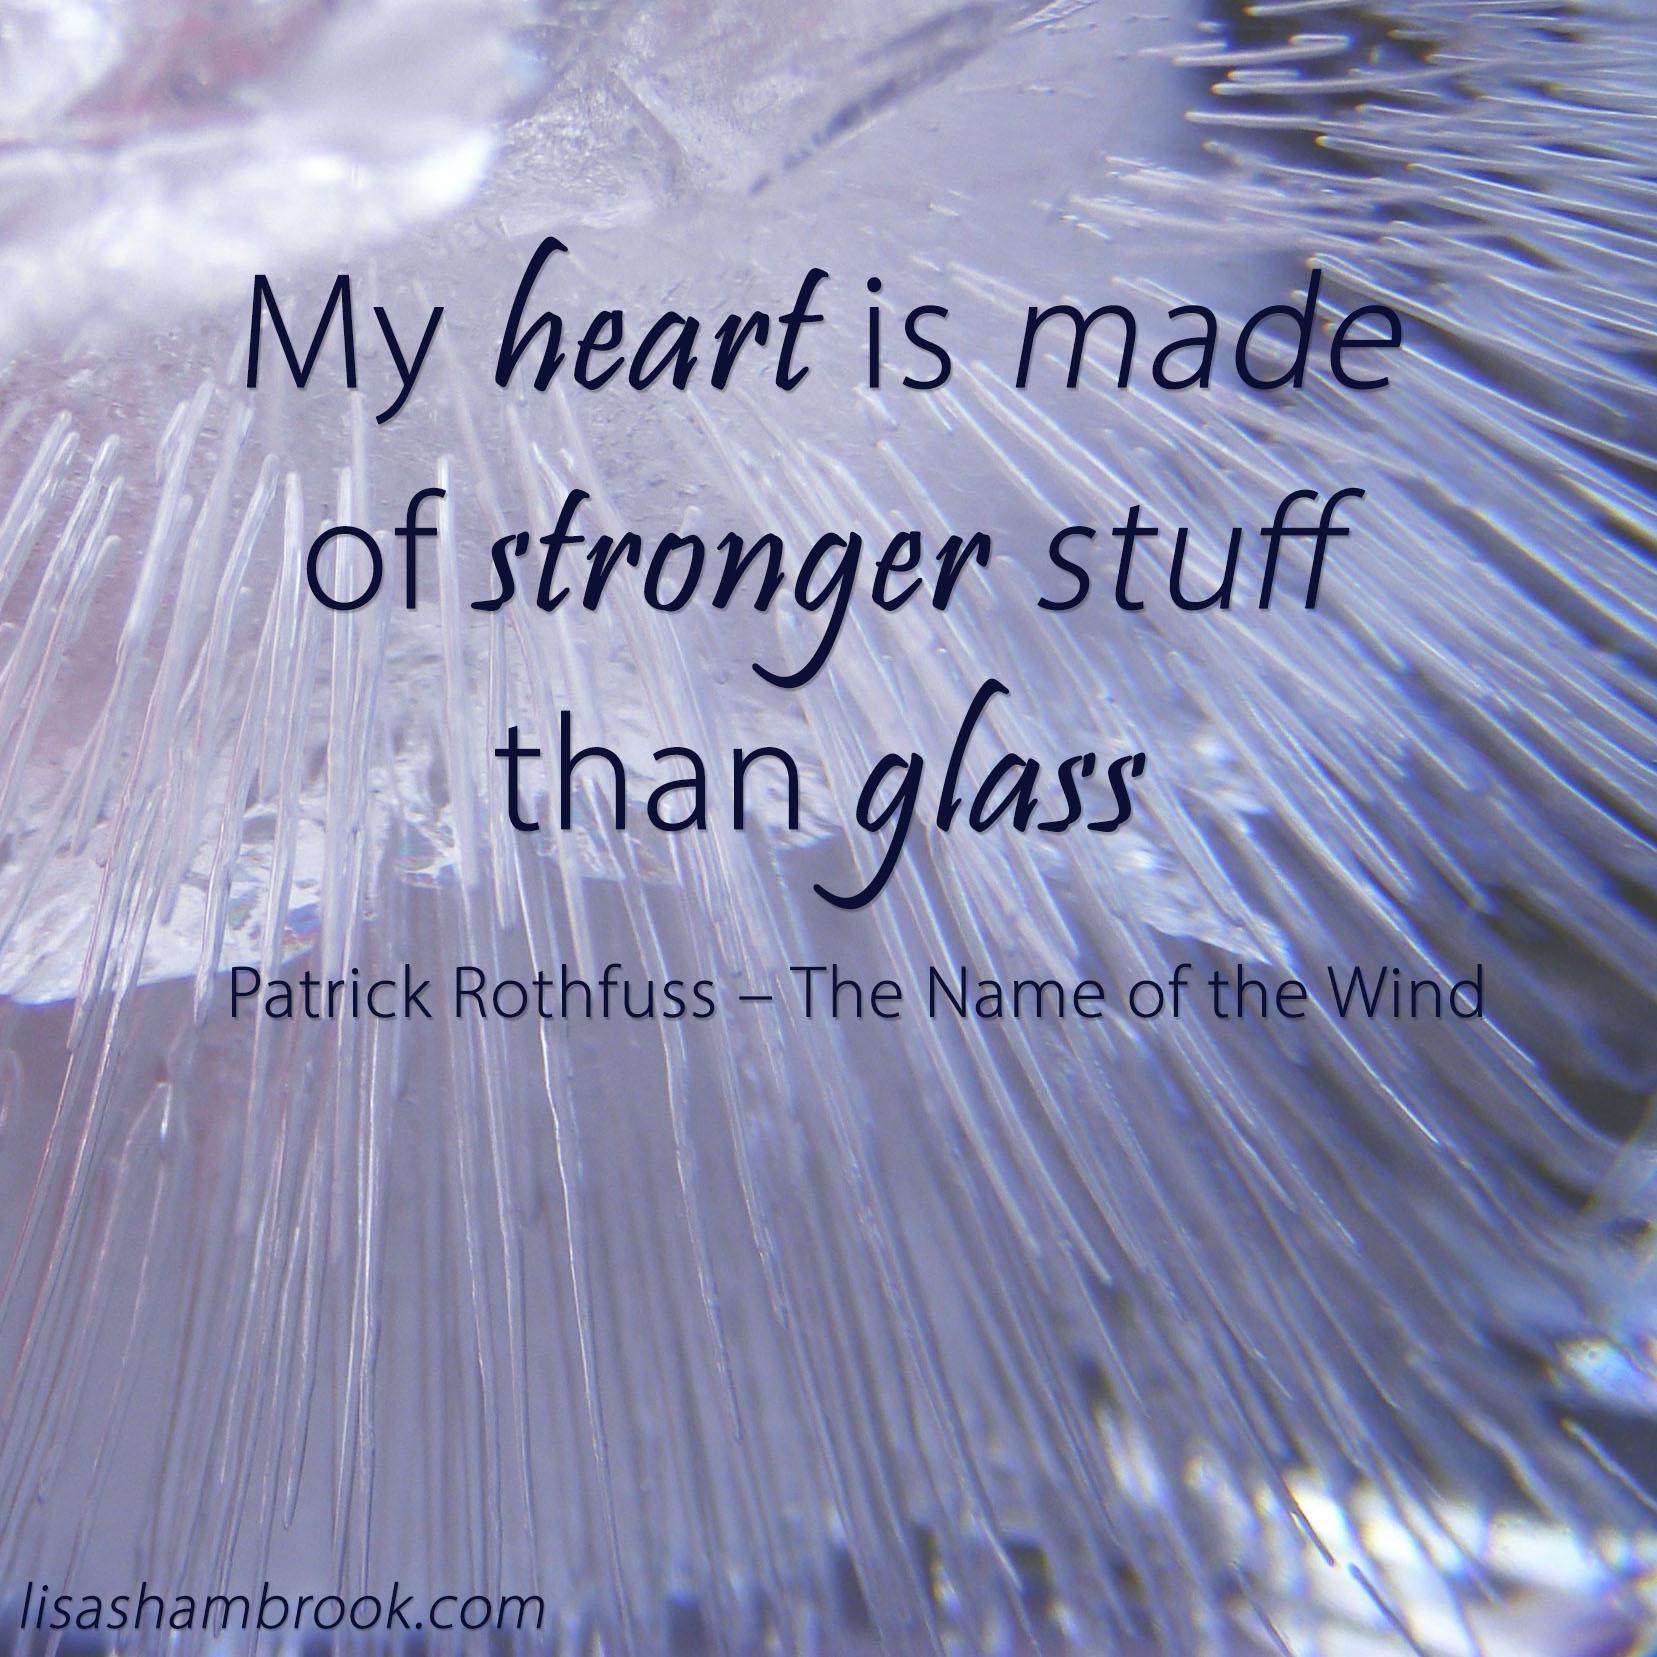 My heart is made of stronger stuff than glass - Patrick Rothfuss - lisa shambrook